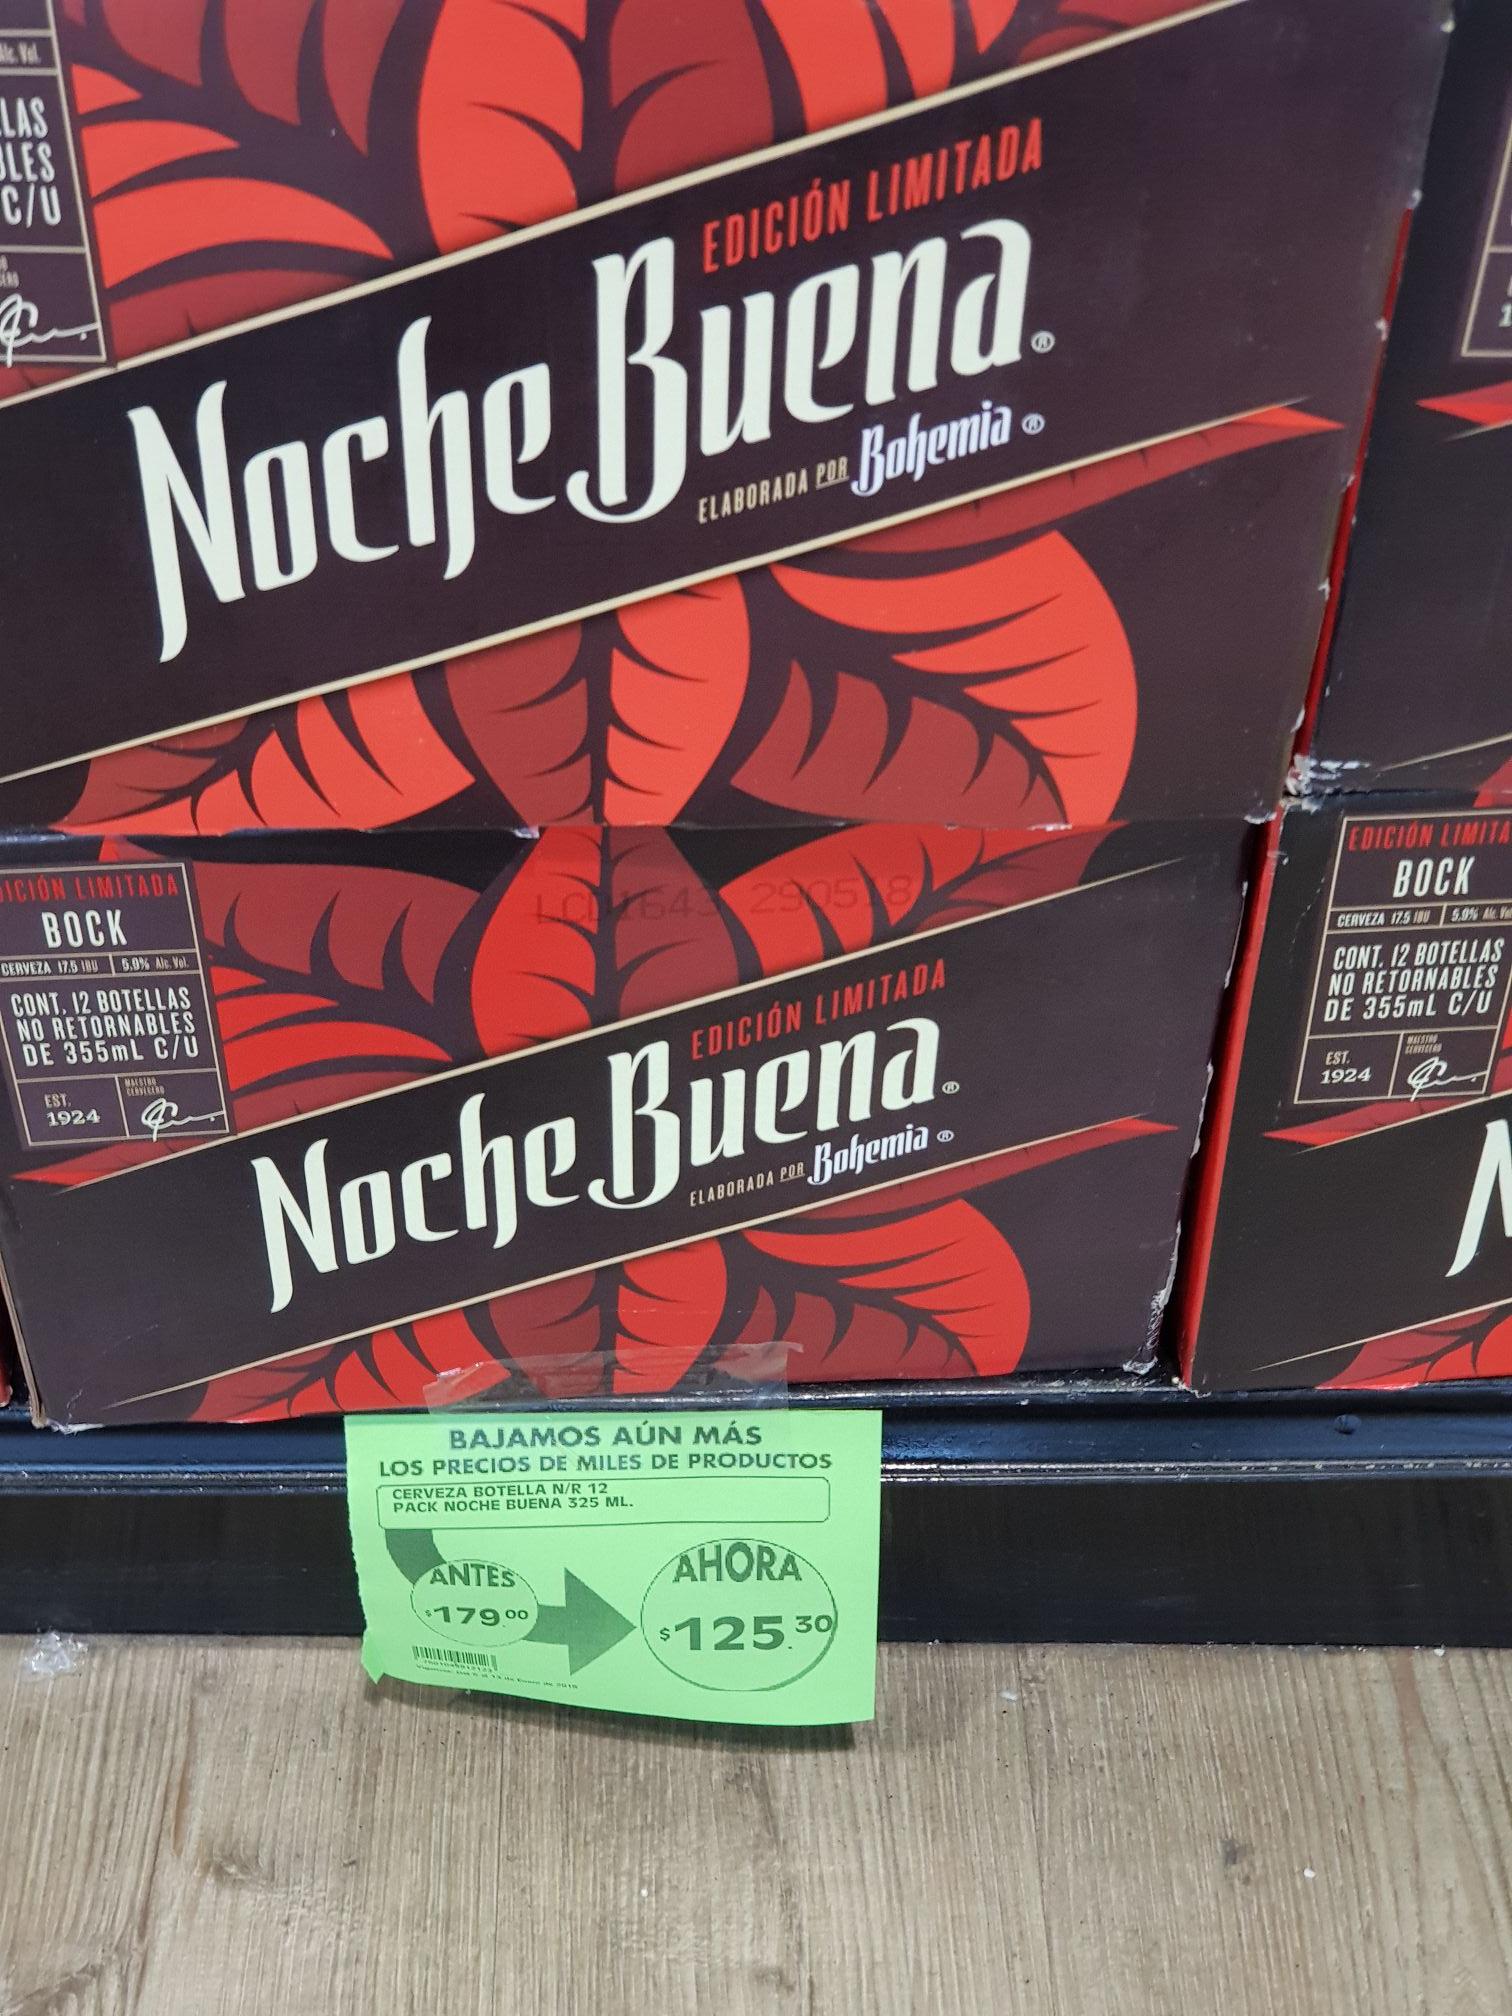 Comercial Mexicana: 12 pack de cerveza nochebuena a $125